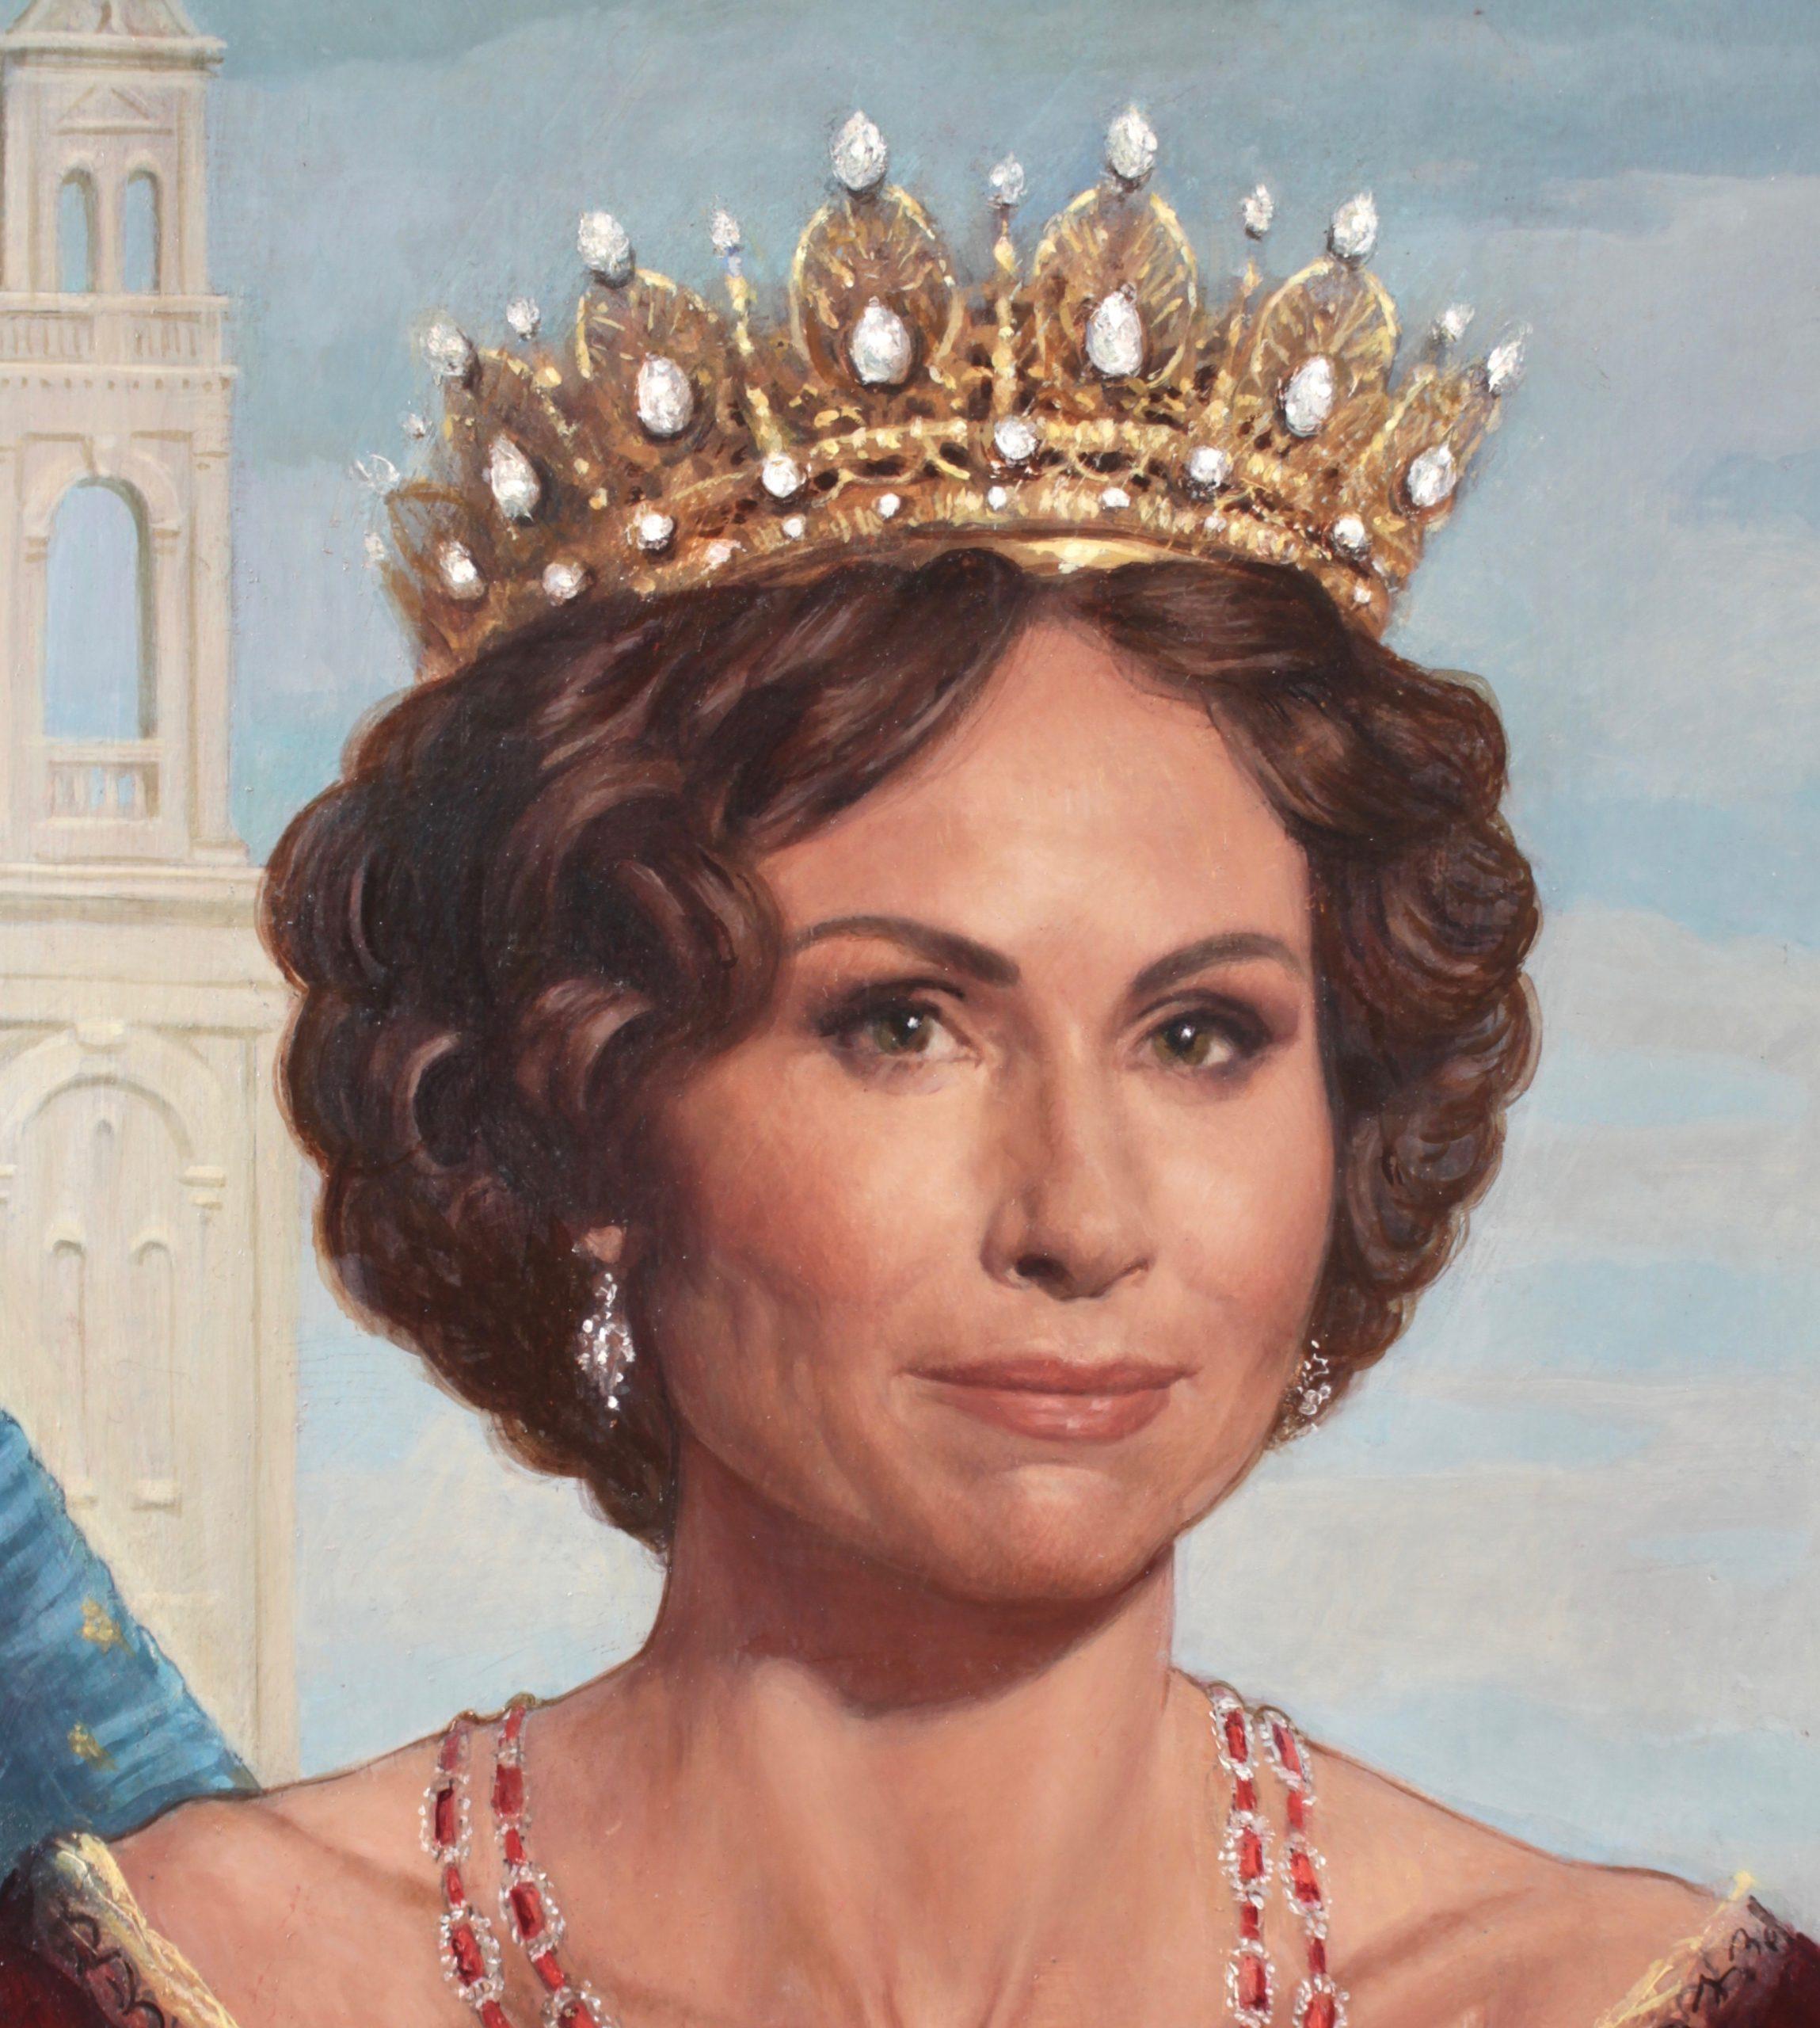 Oil portrait of Minnie Driver by Desmond Mac Mahon for the film Cinderella